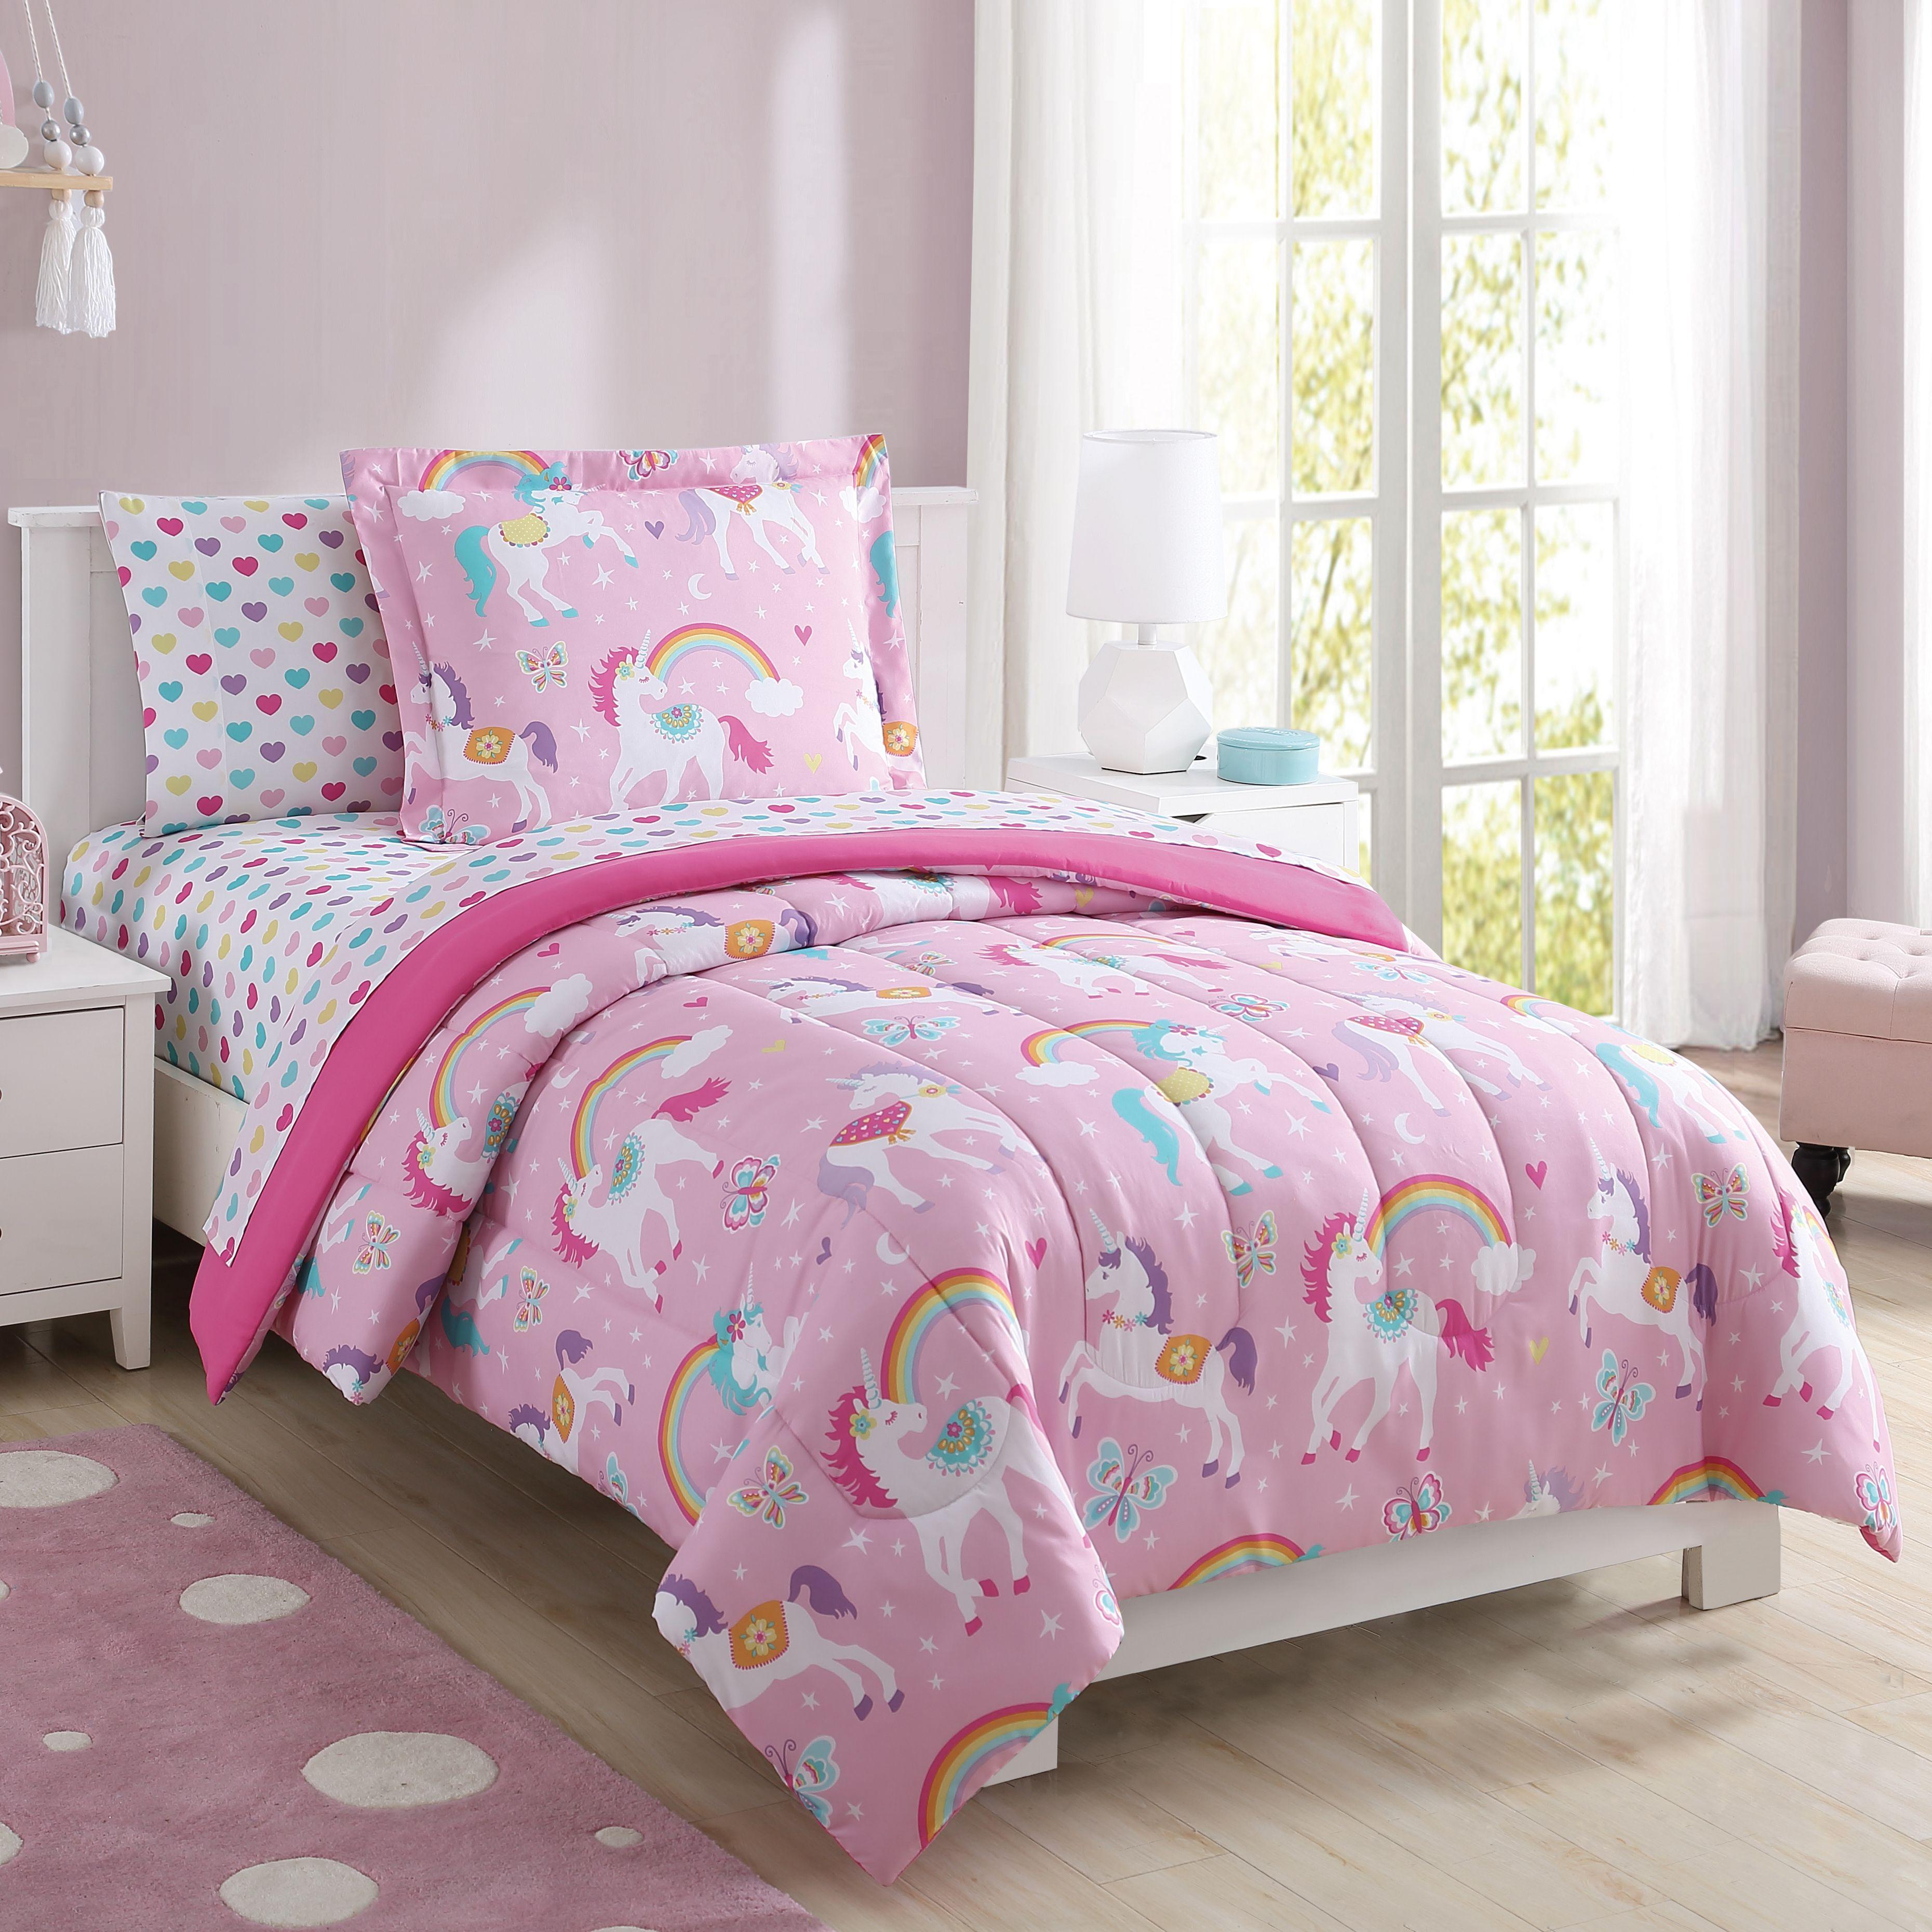 Home Complete Bedding Set Unicorn Bedding Girl Beds